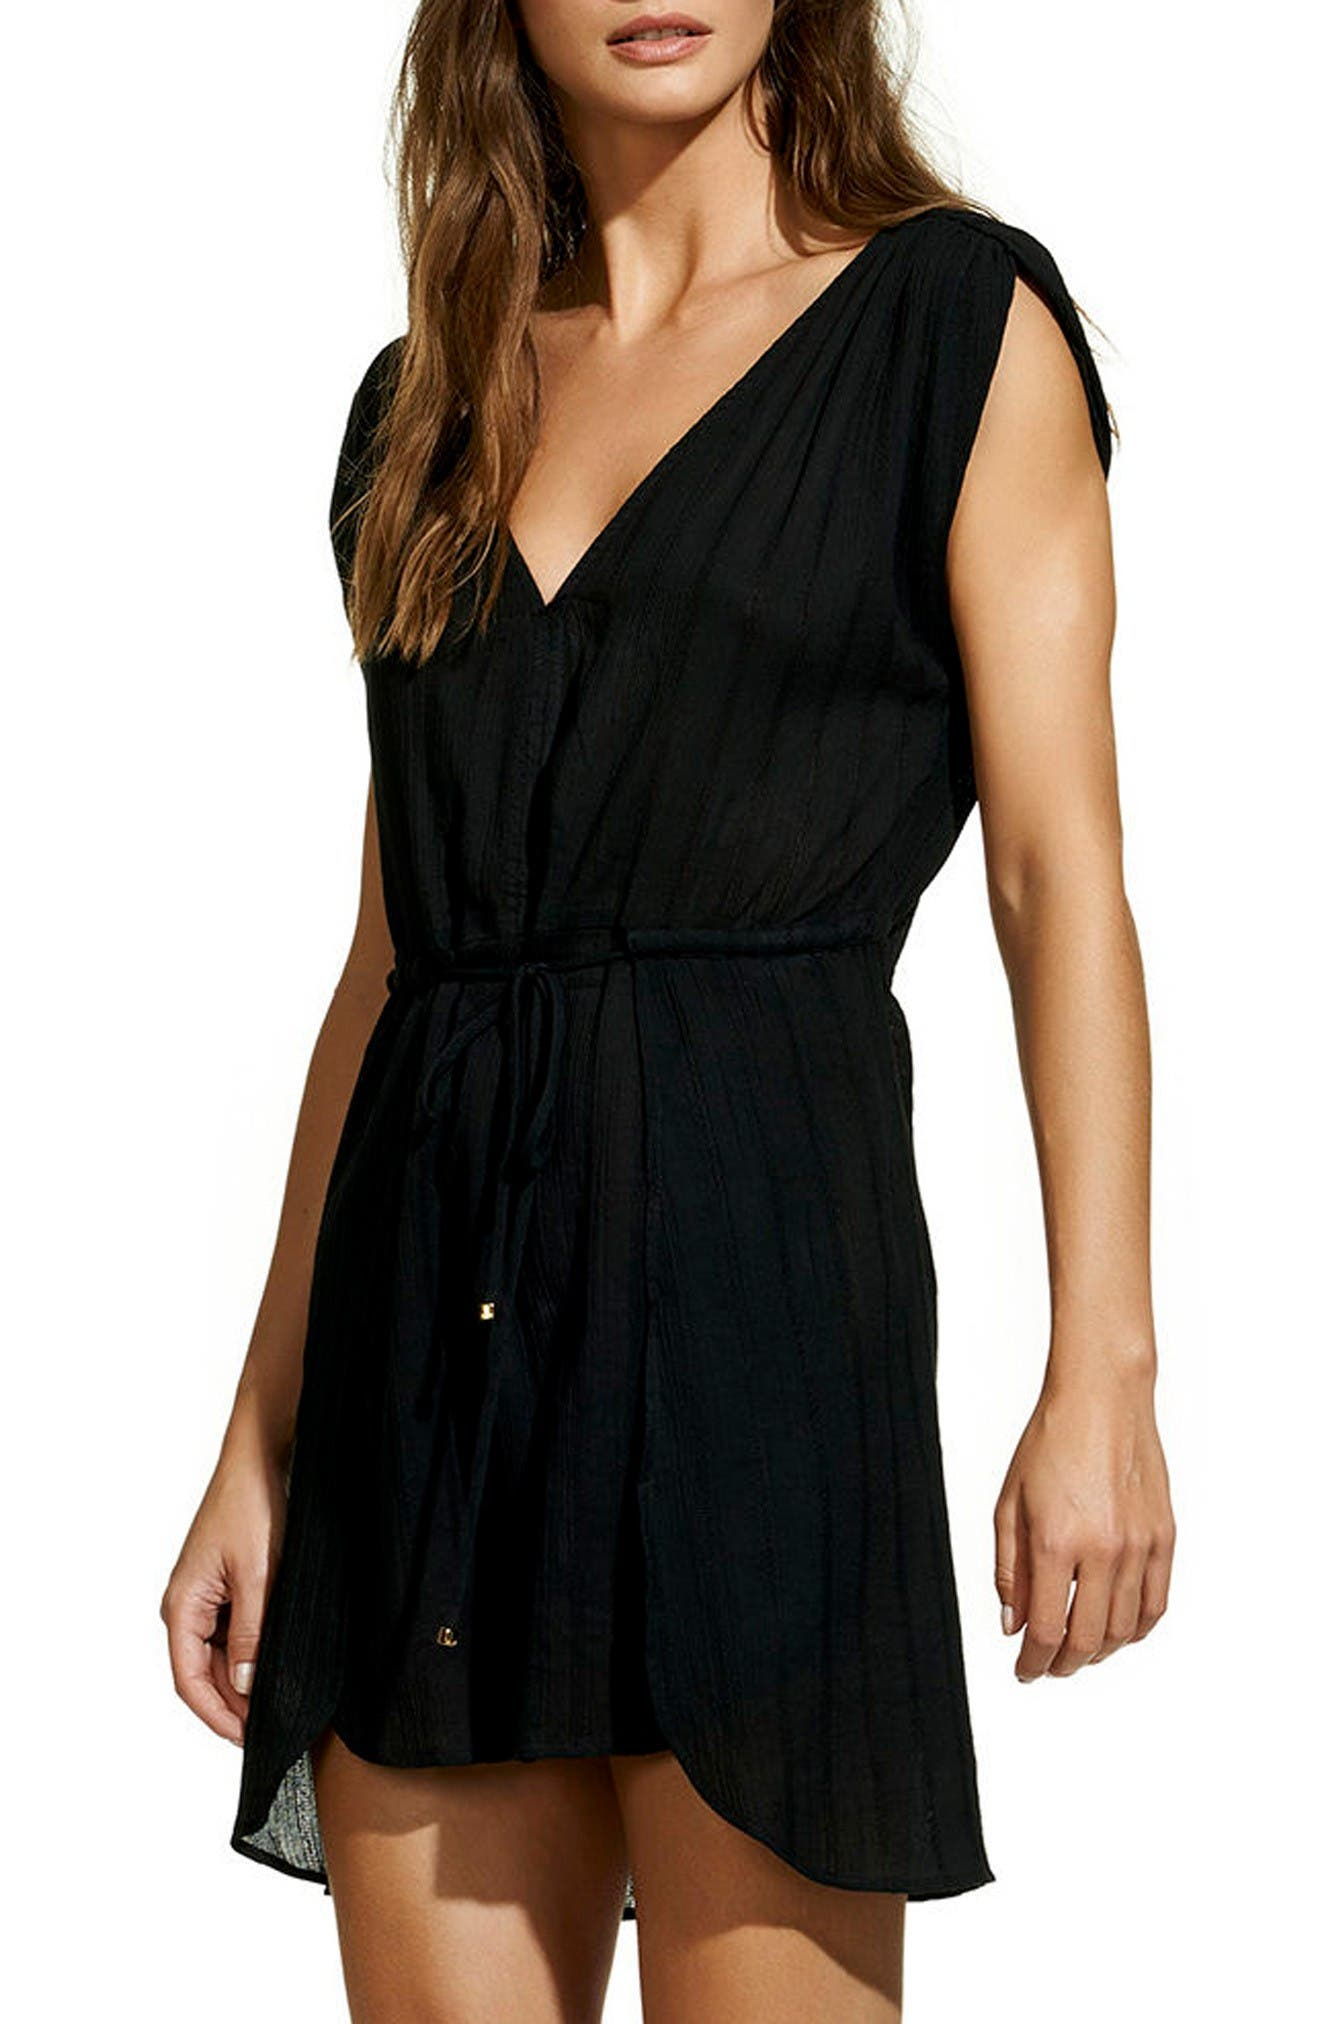 Vix Swimwear Agatha Cover-Up Caftan